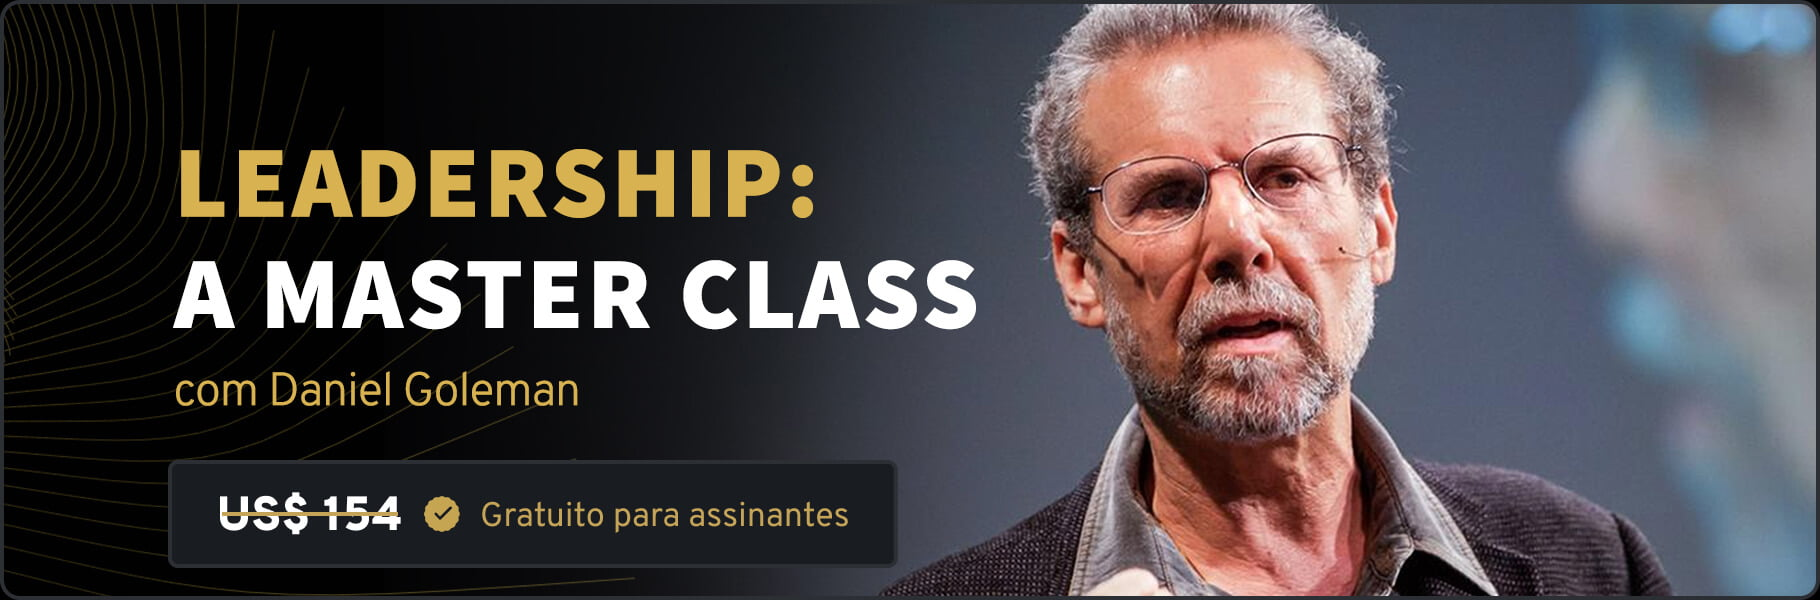 Leadership: A Master Class com Daniel Goleman